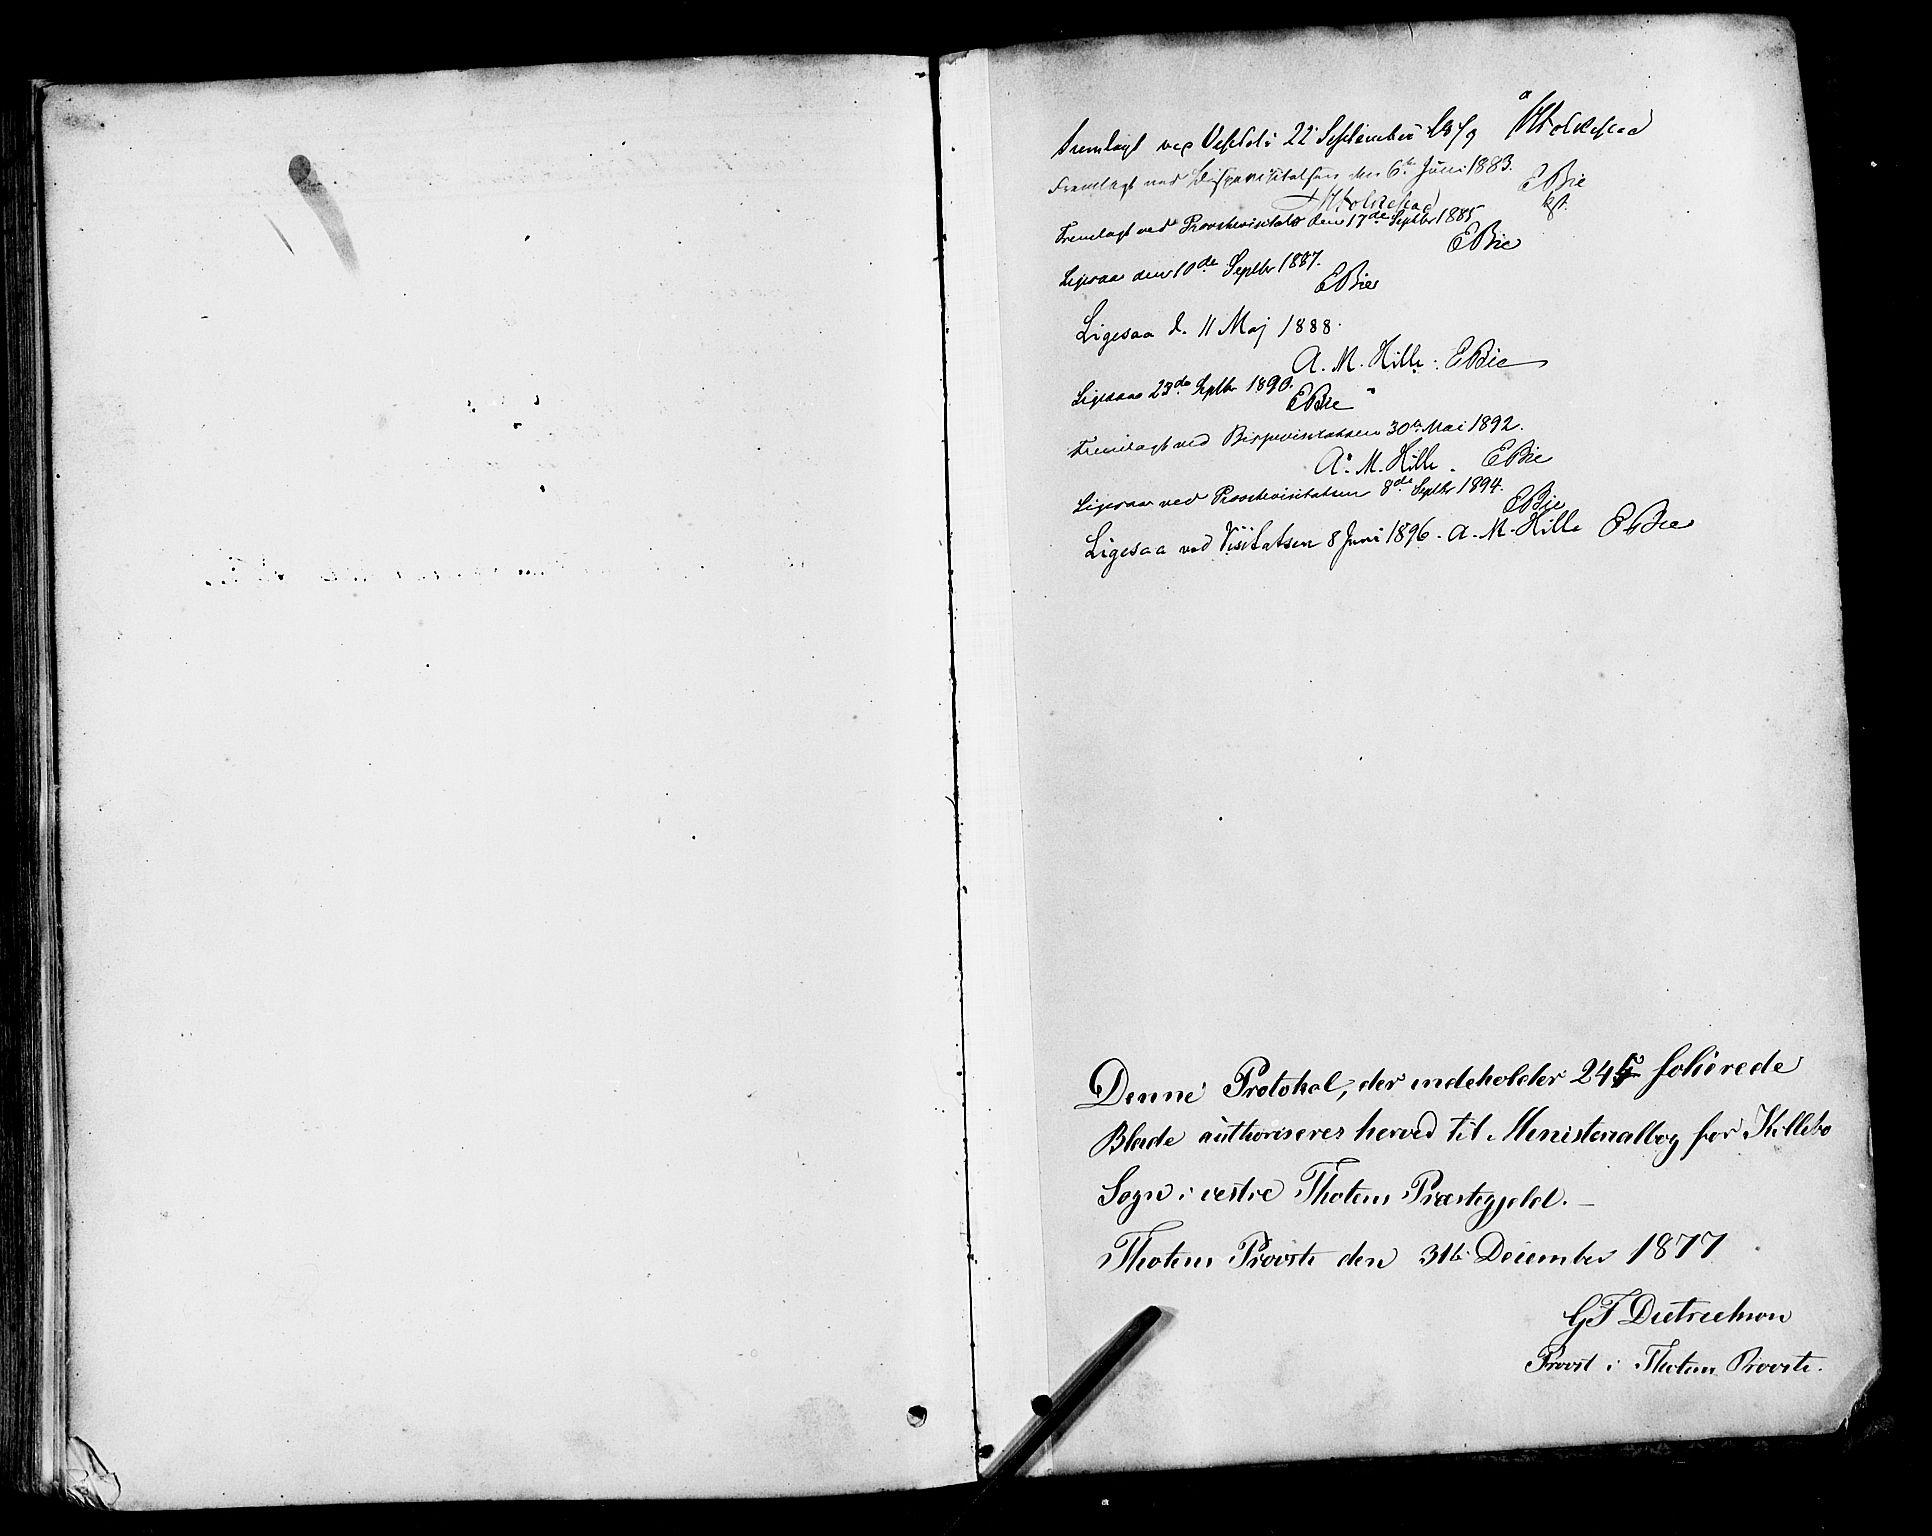 SAH, Vestre Toten prestekontor, Ministerialbok nr. 10, 1878-1894